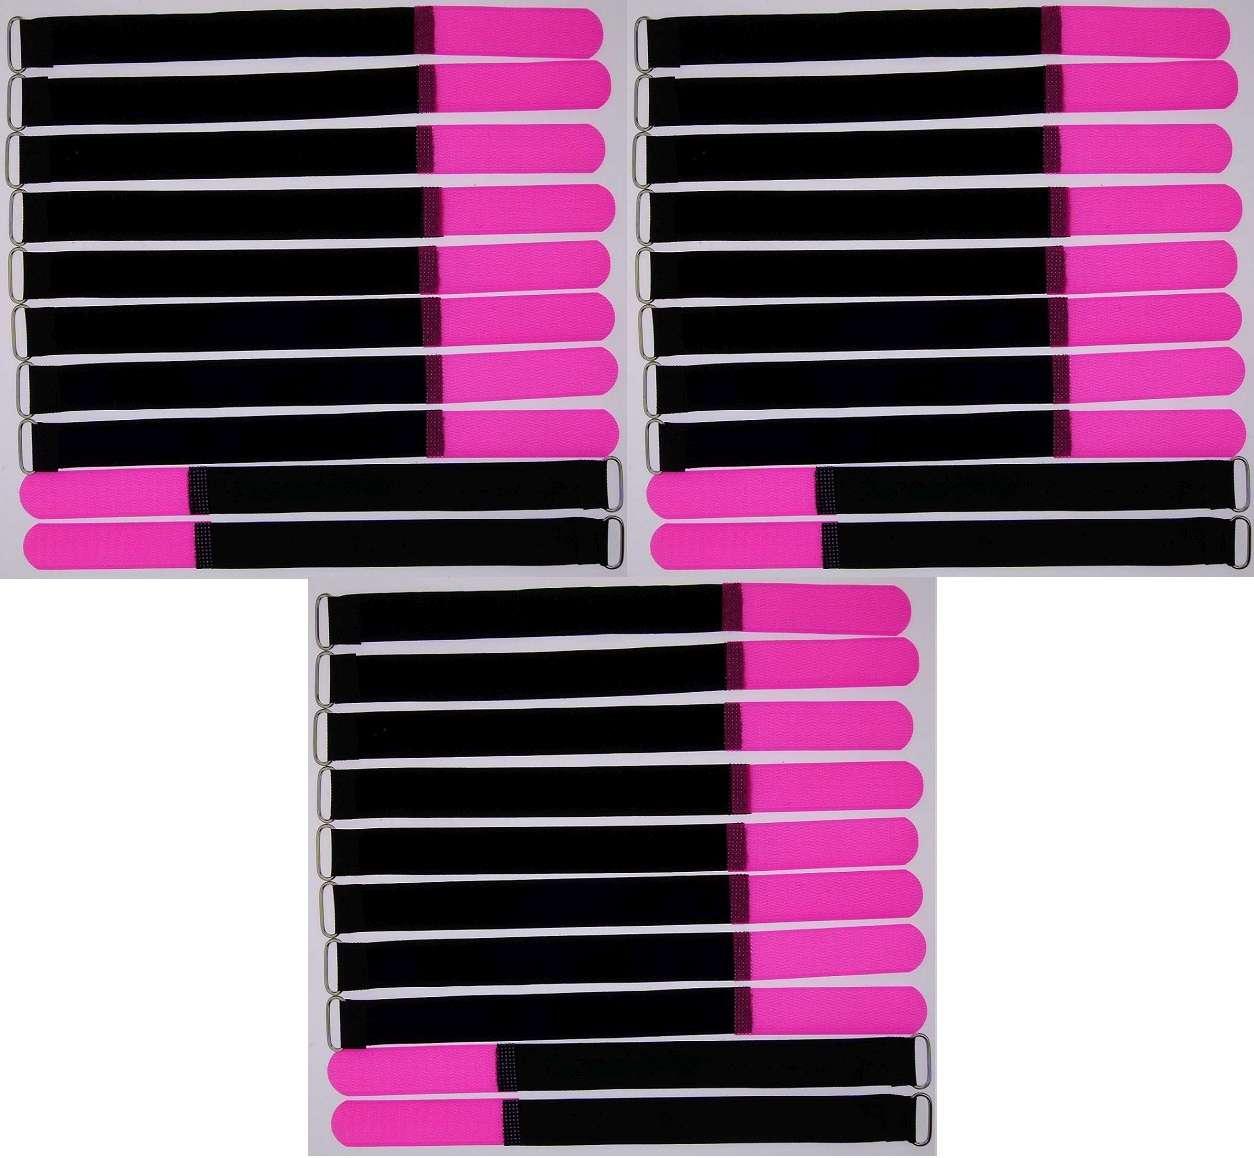 Öse 300 x 25 mm neongrün Kabelbinder Klettband Kabelklett 30 Klettkabelbinder m